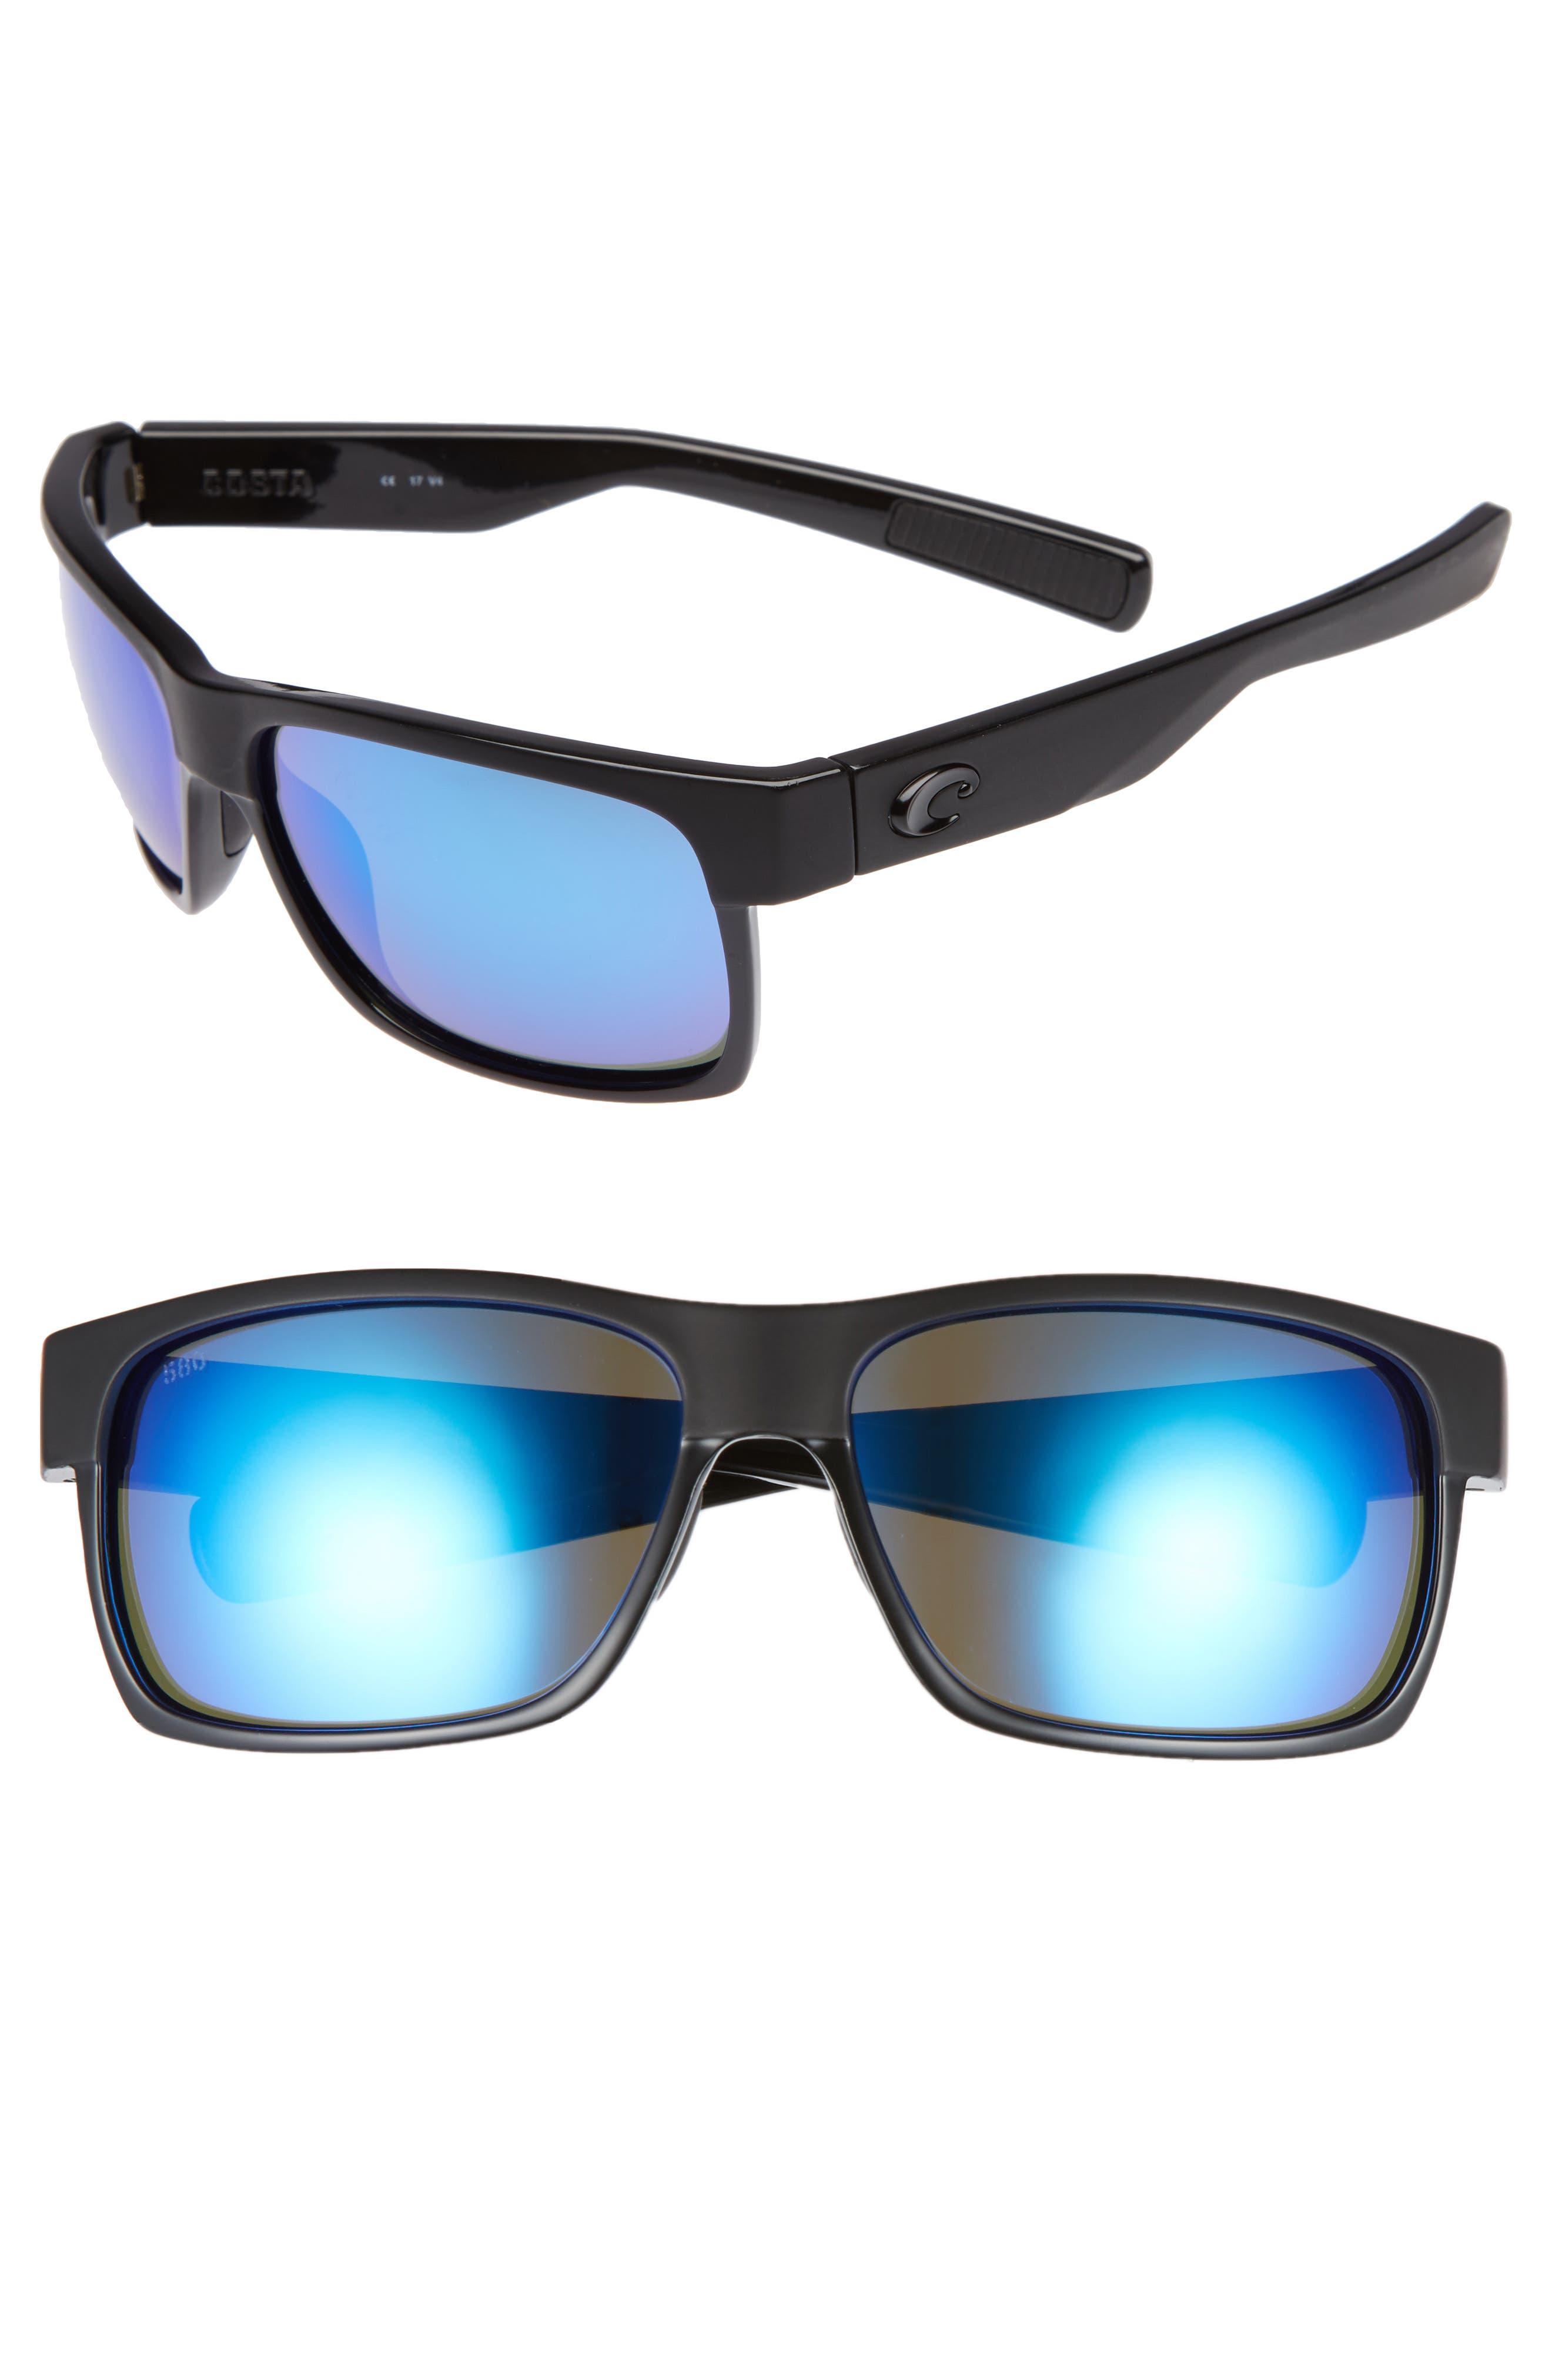 Half Moon 60mm Polarized Sunglasses,                             Main thumbnail 1, color,                             BLACK/ BLUE MIRROR